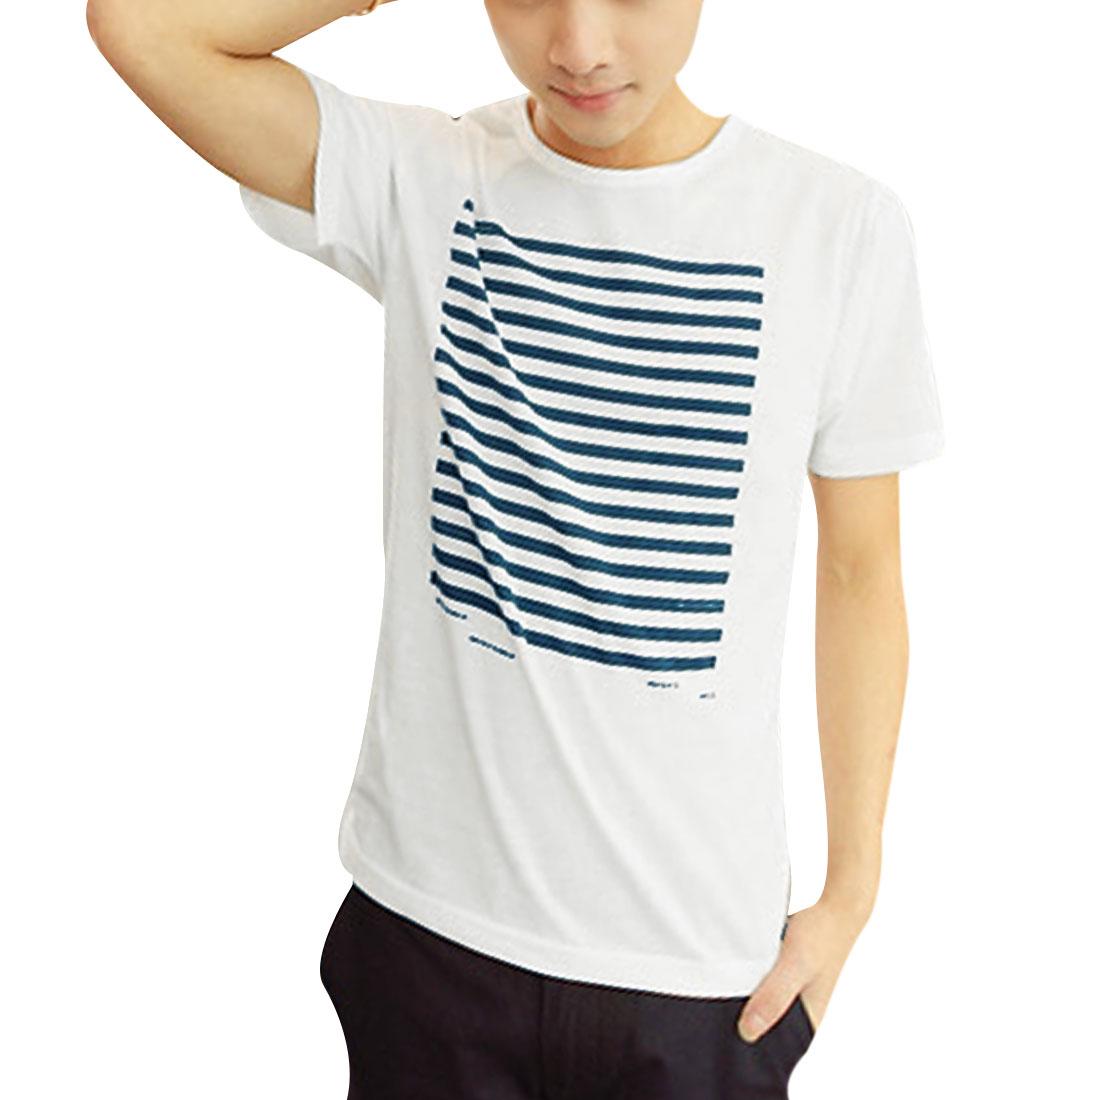 Men Chic Short Sleeve Stripes Prints Slim Fit White Shirt S